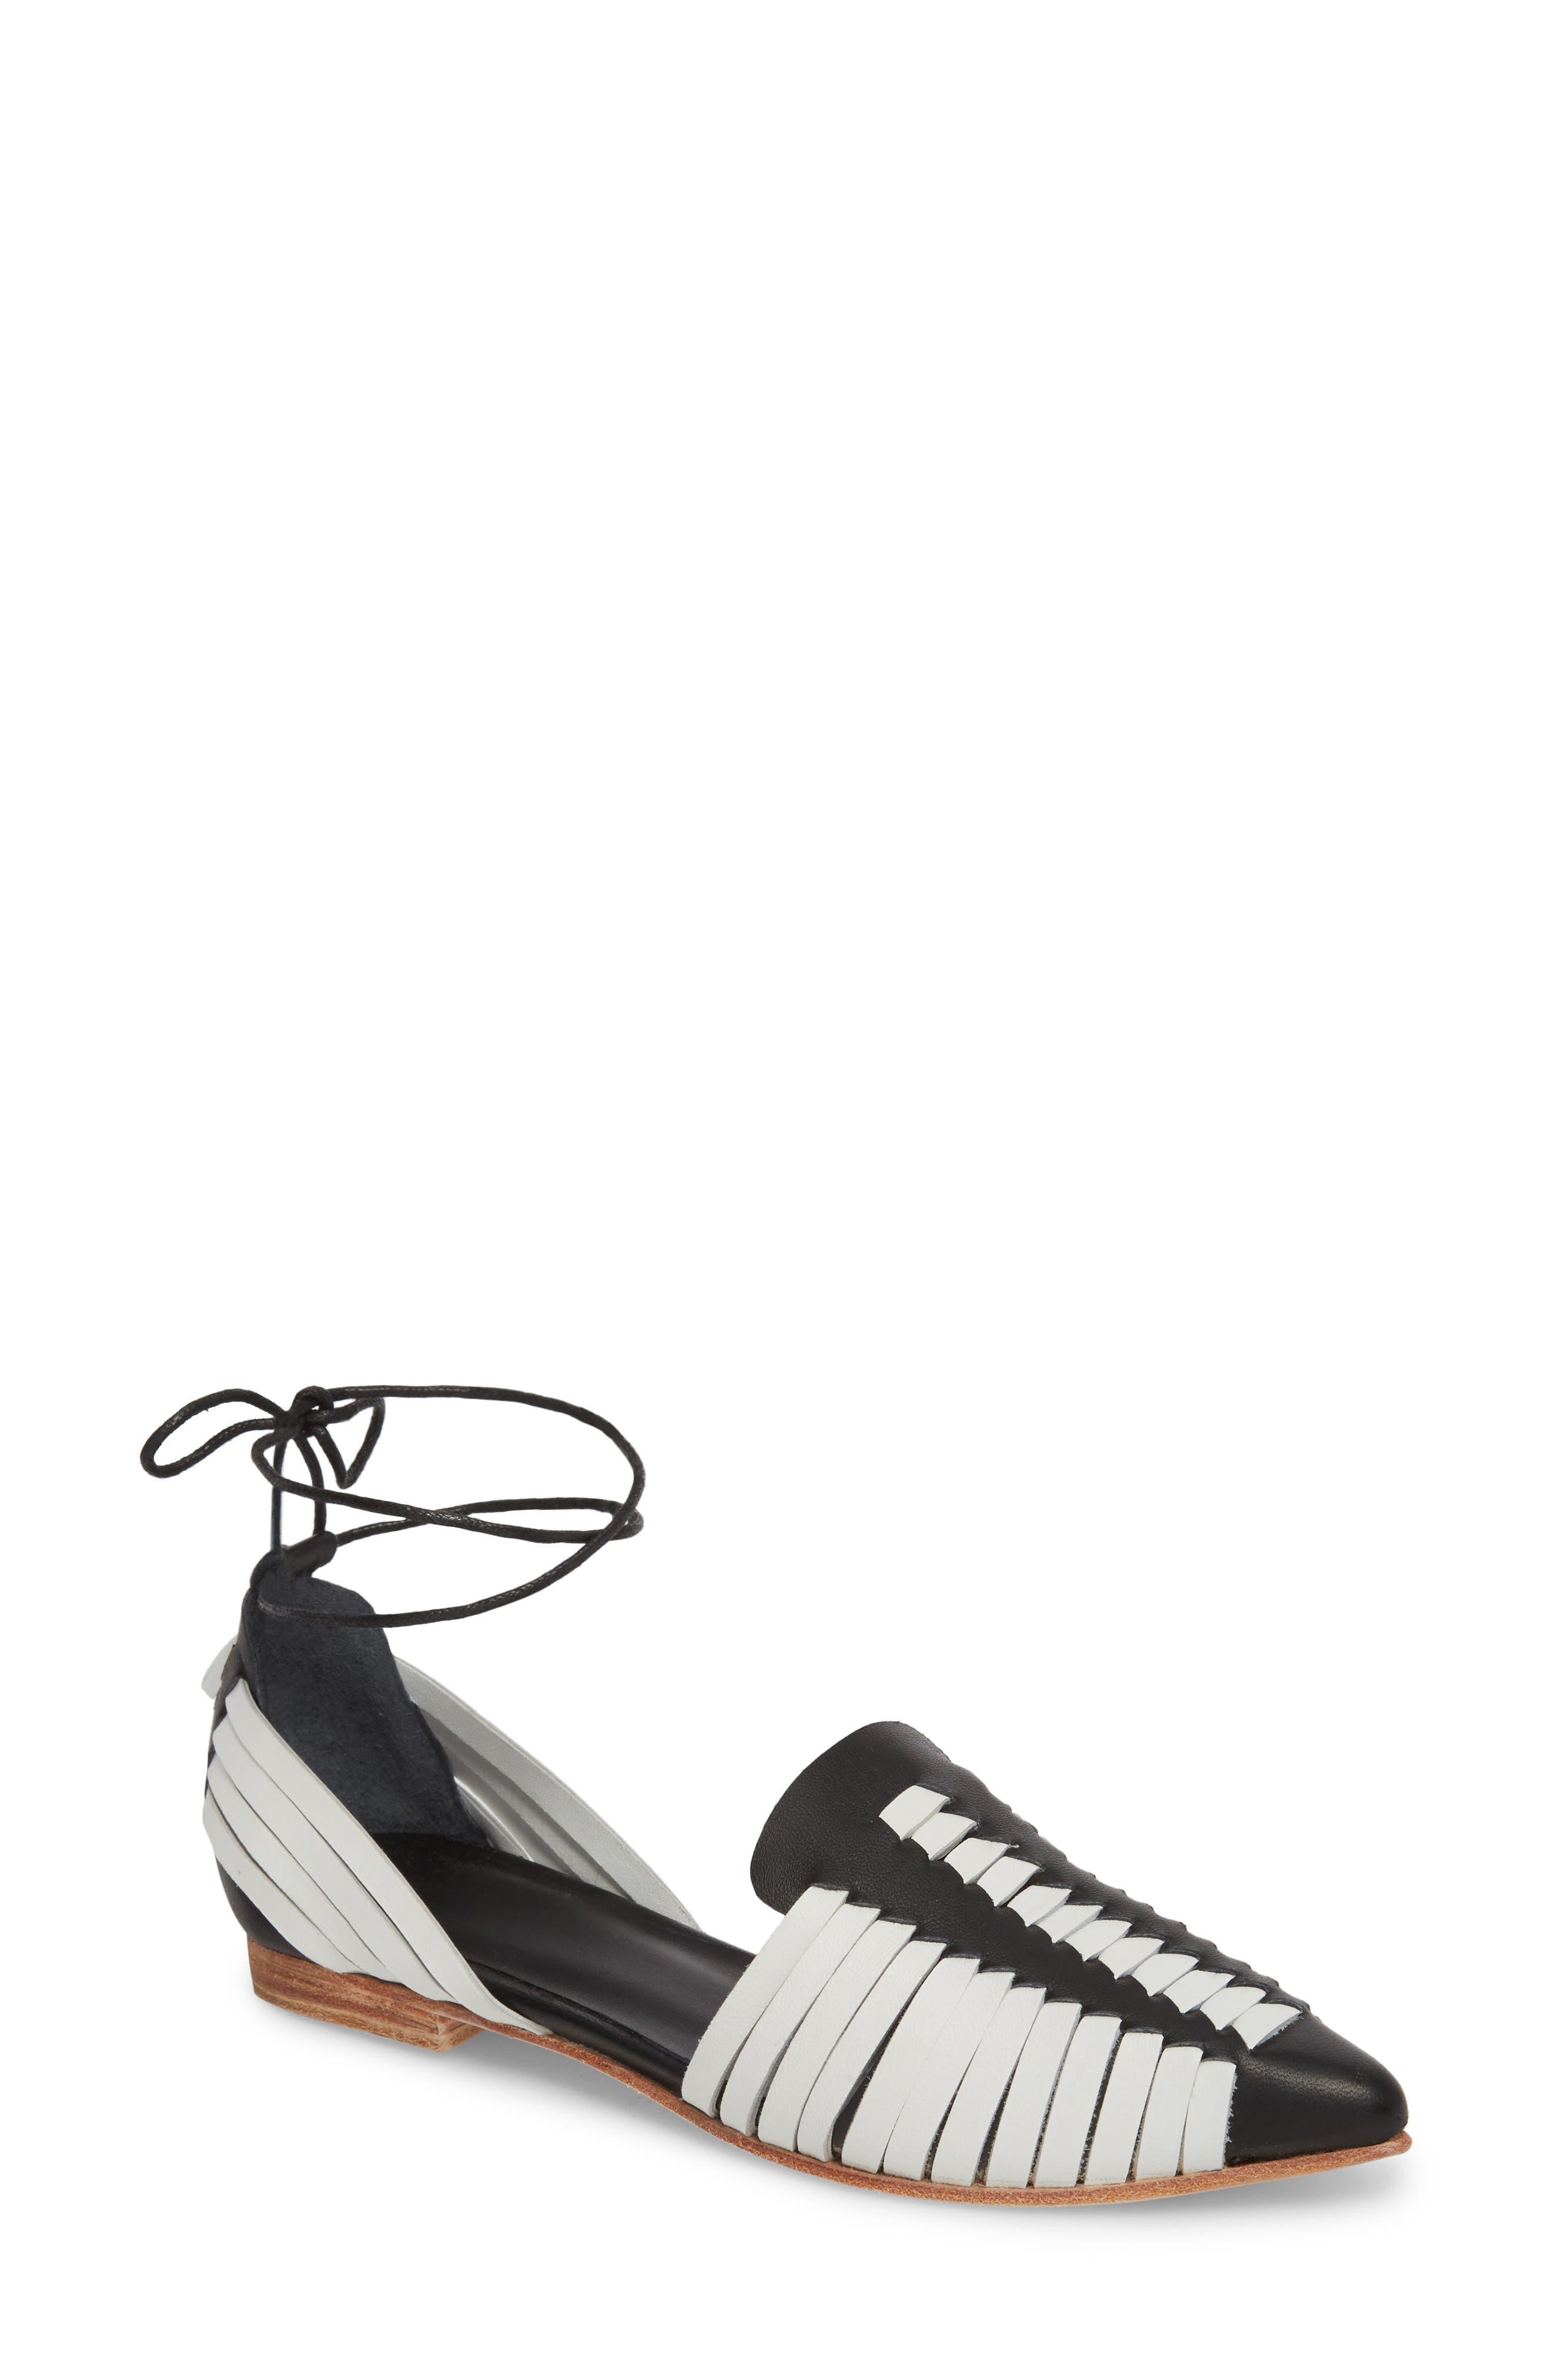 Hollis Huarache Ankle Tie Flat,                             Main thumbnail 1, color,                             BLACK/ WHITE LEATHER